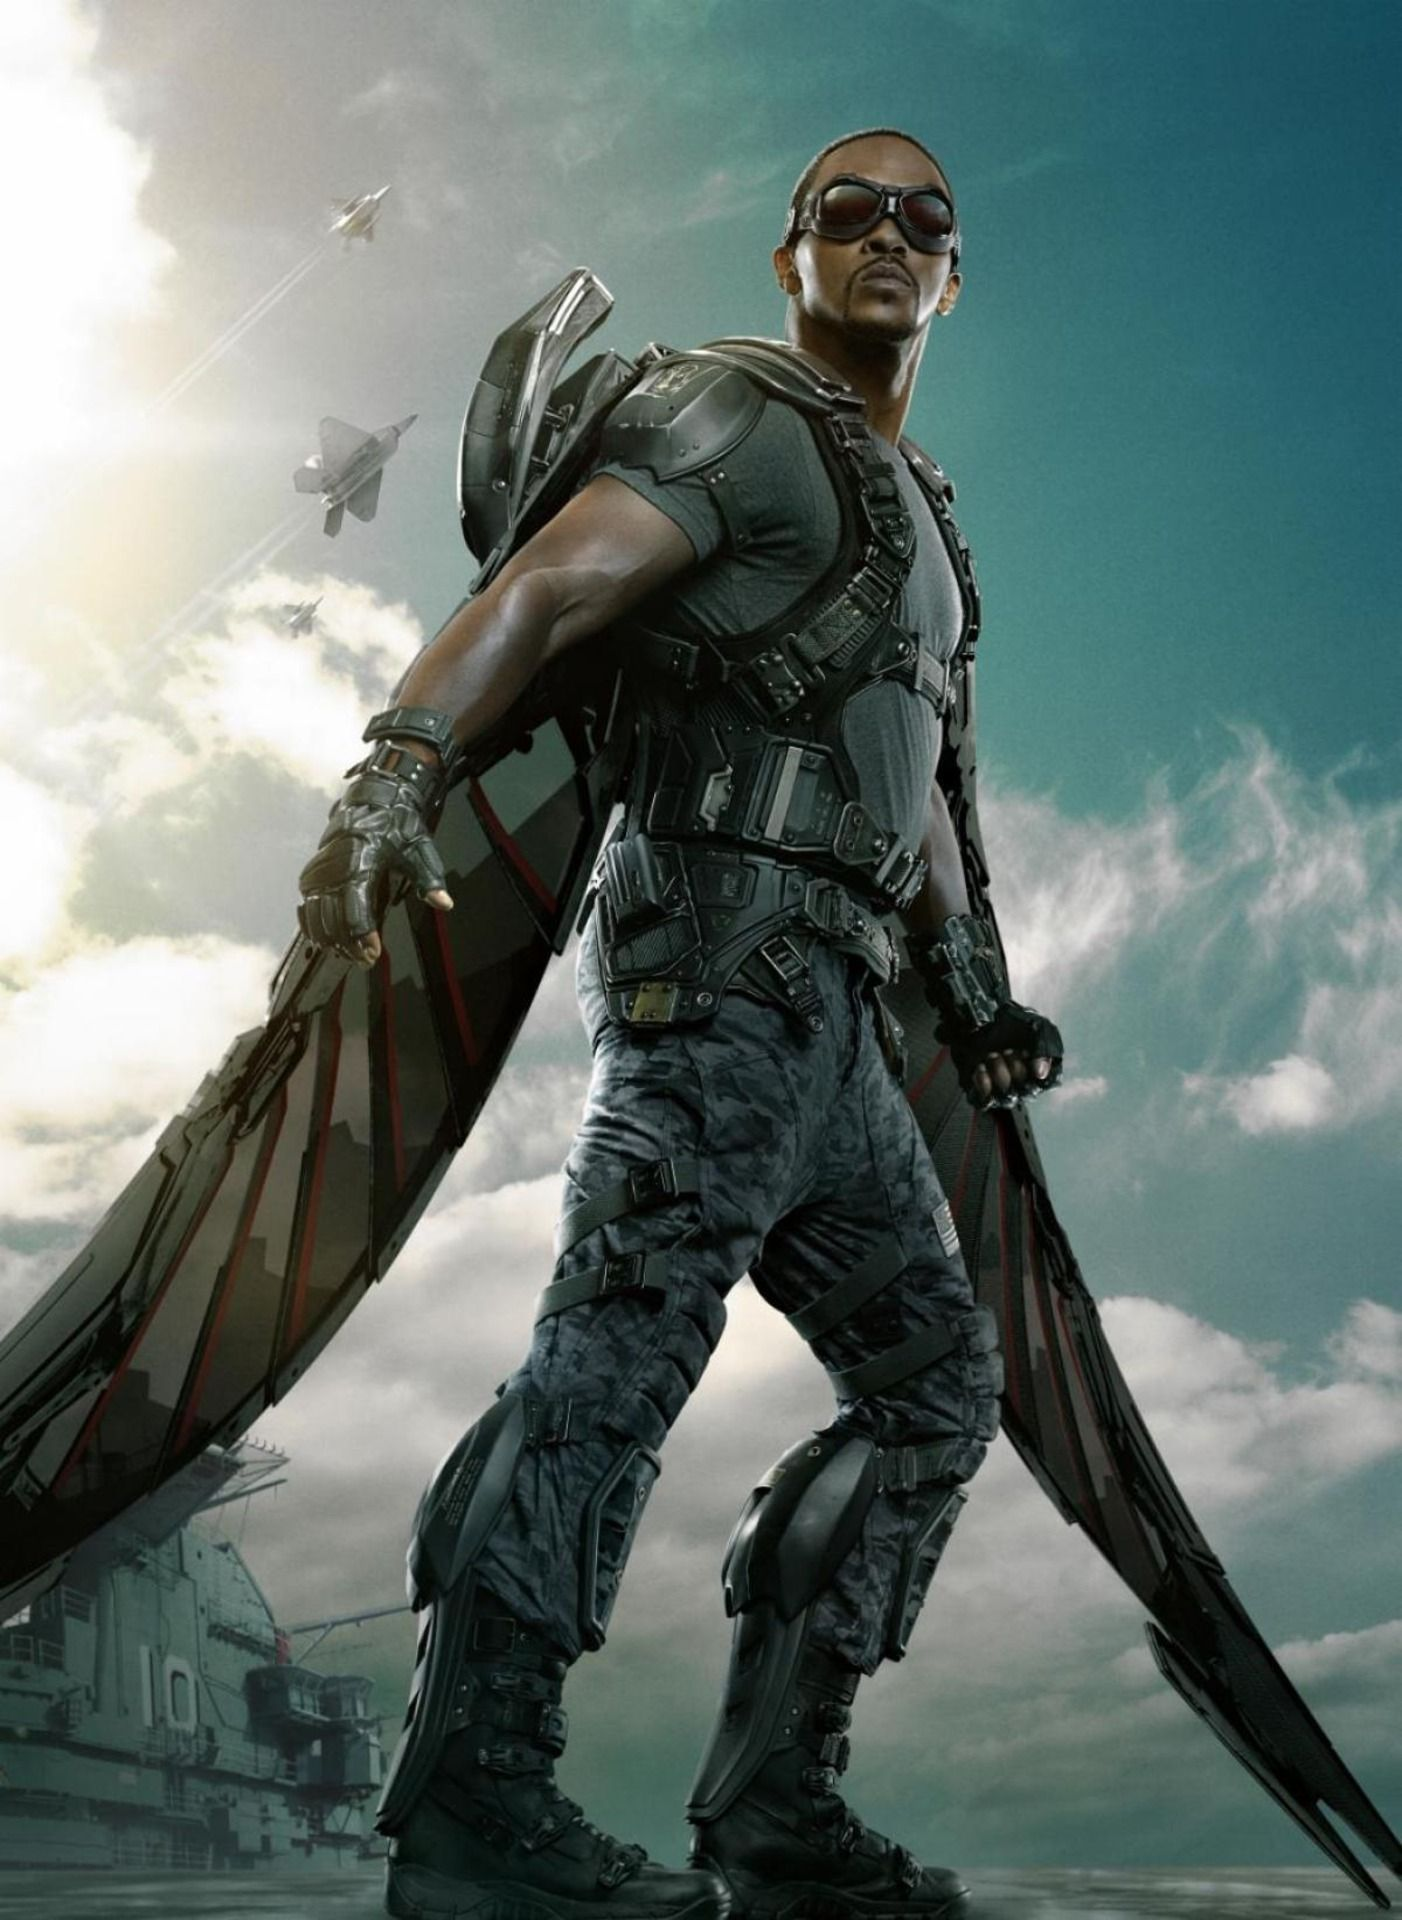 falcon mcu - Google Search | Fantasy | Marvel, Marvel ...